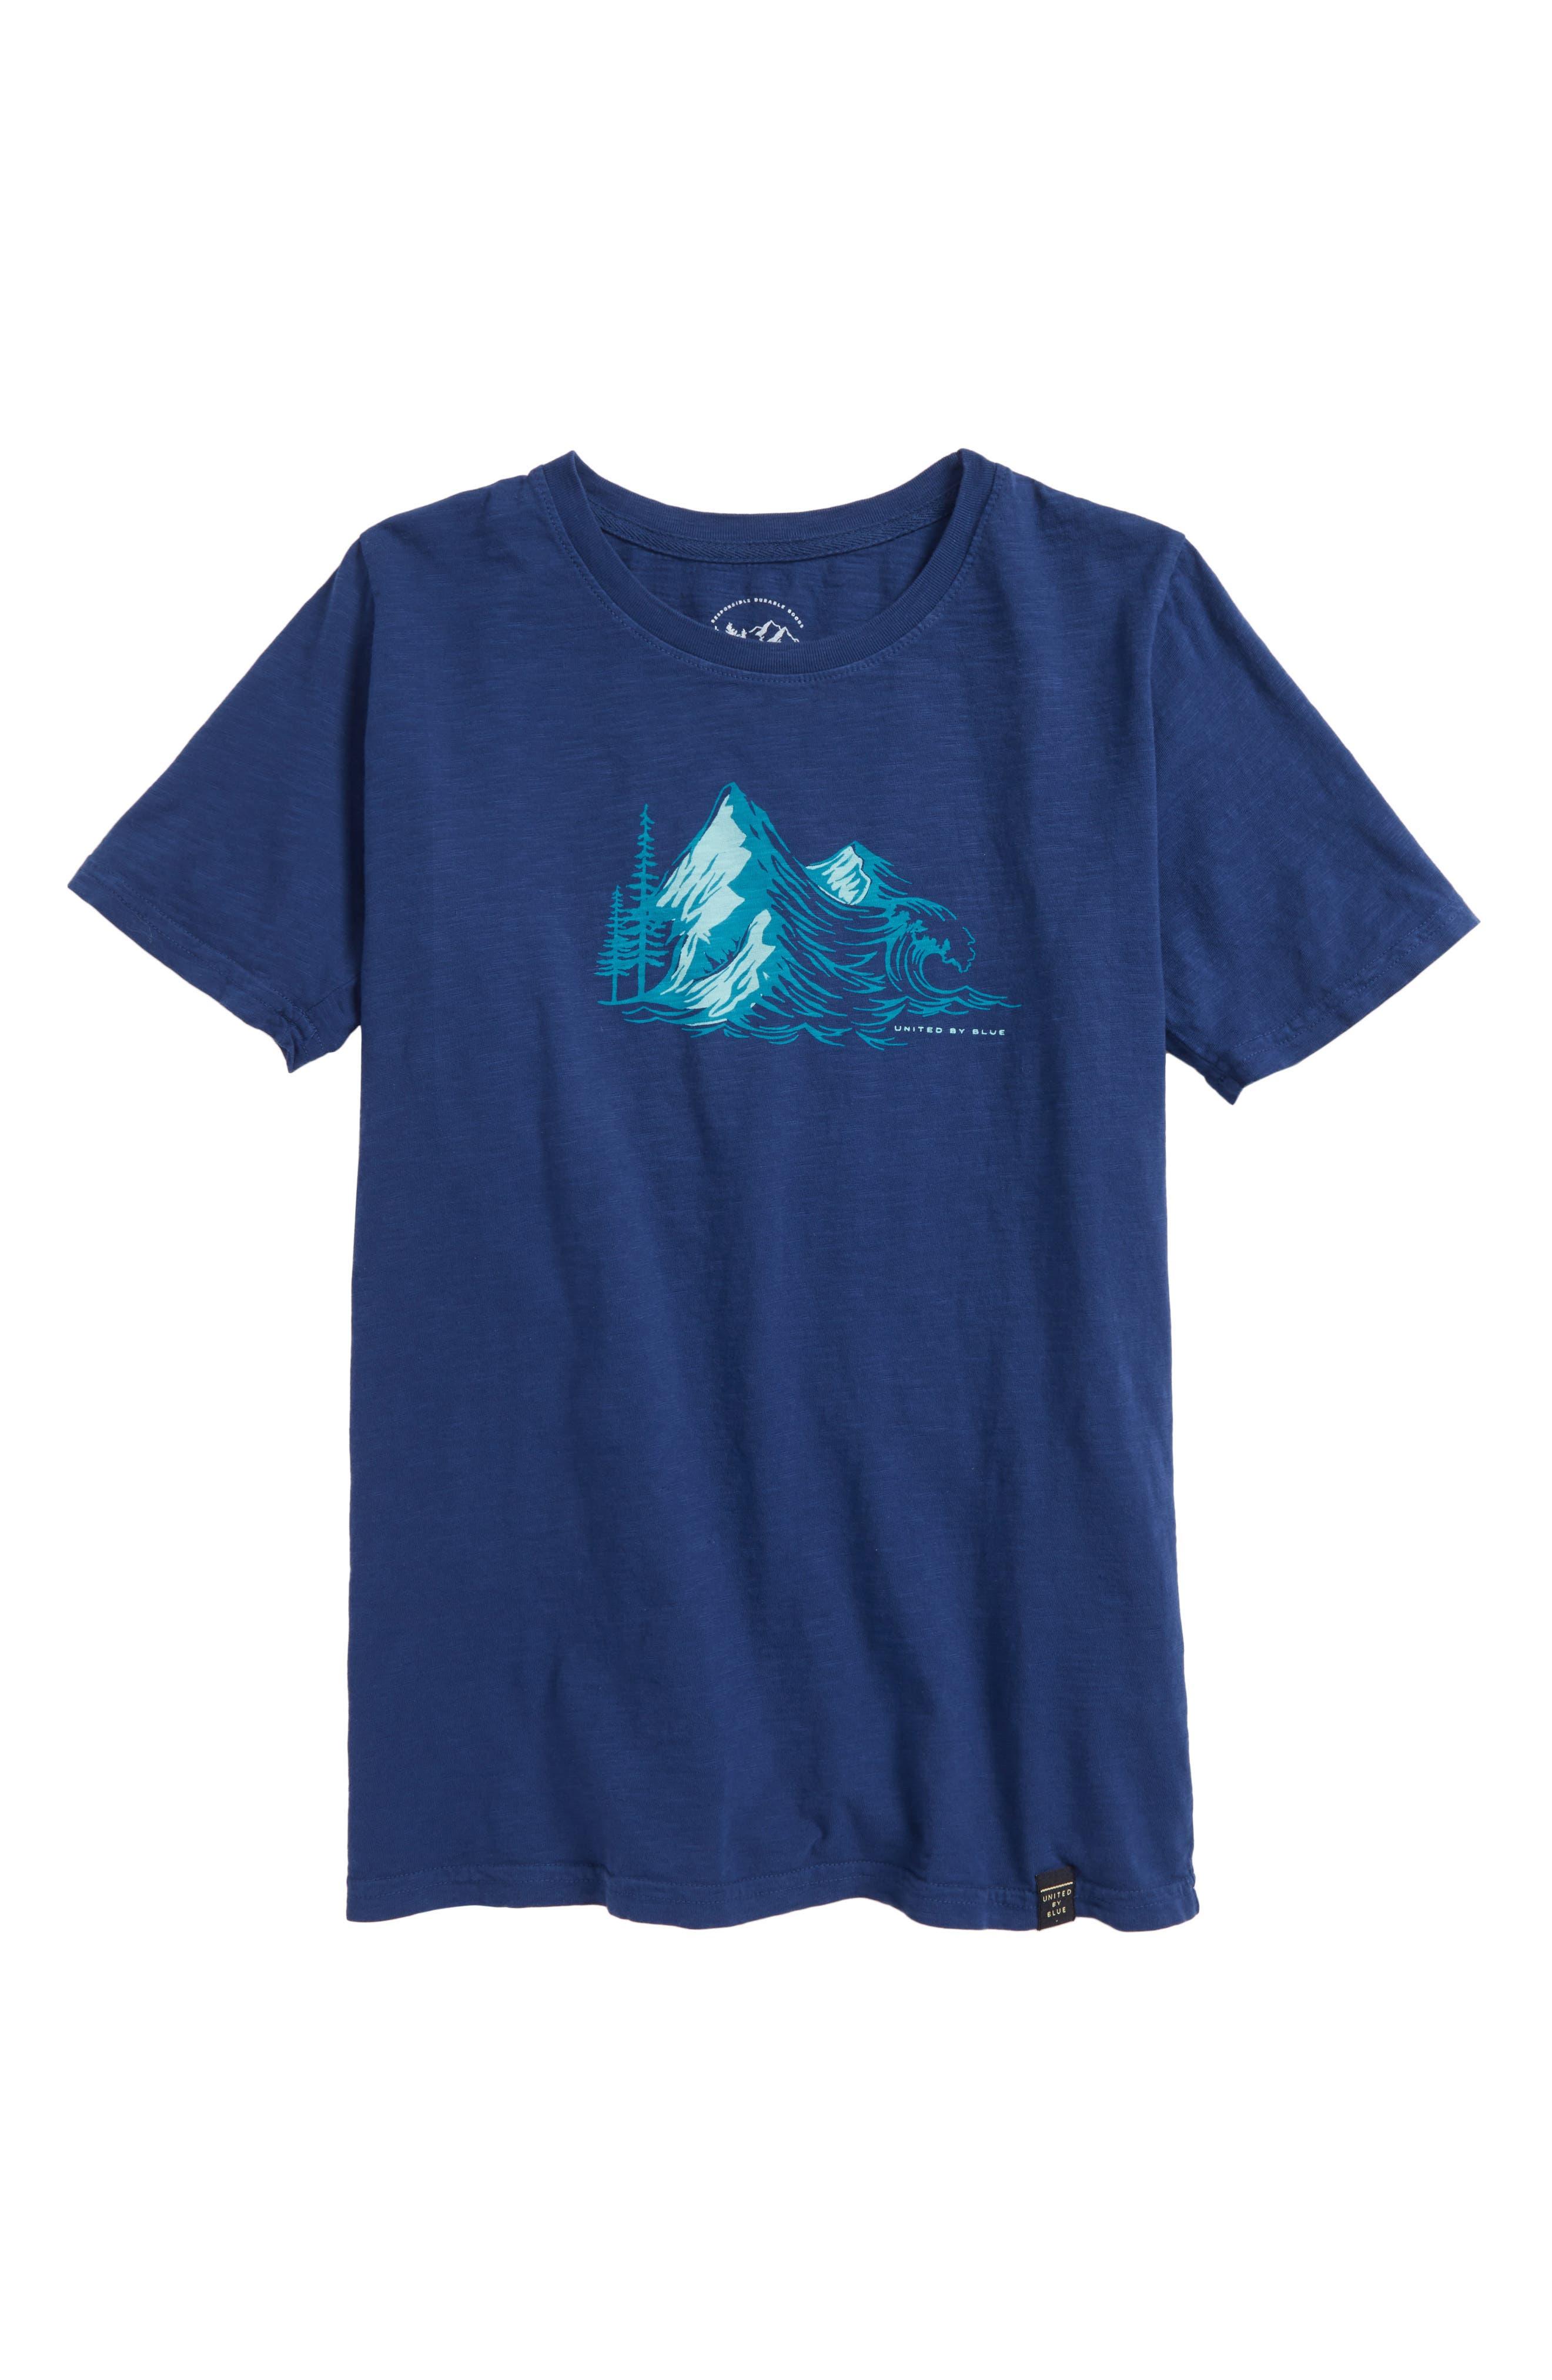 Main Image - United By Blue Peaks Graphic Organic Cotton T-Shirt (Little Boys & Big Boys)